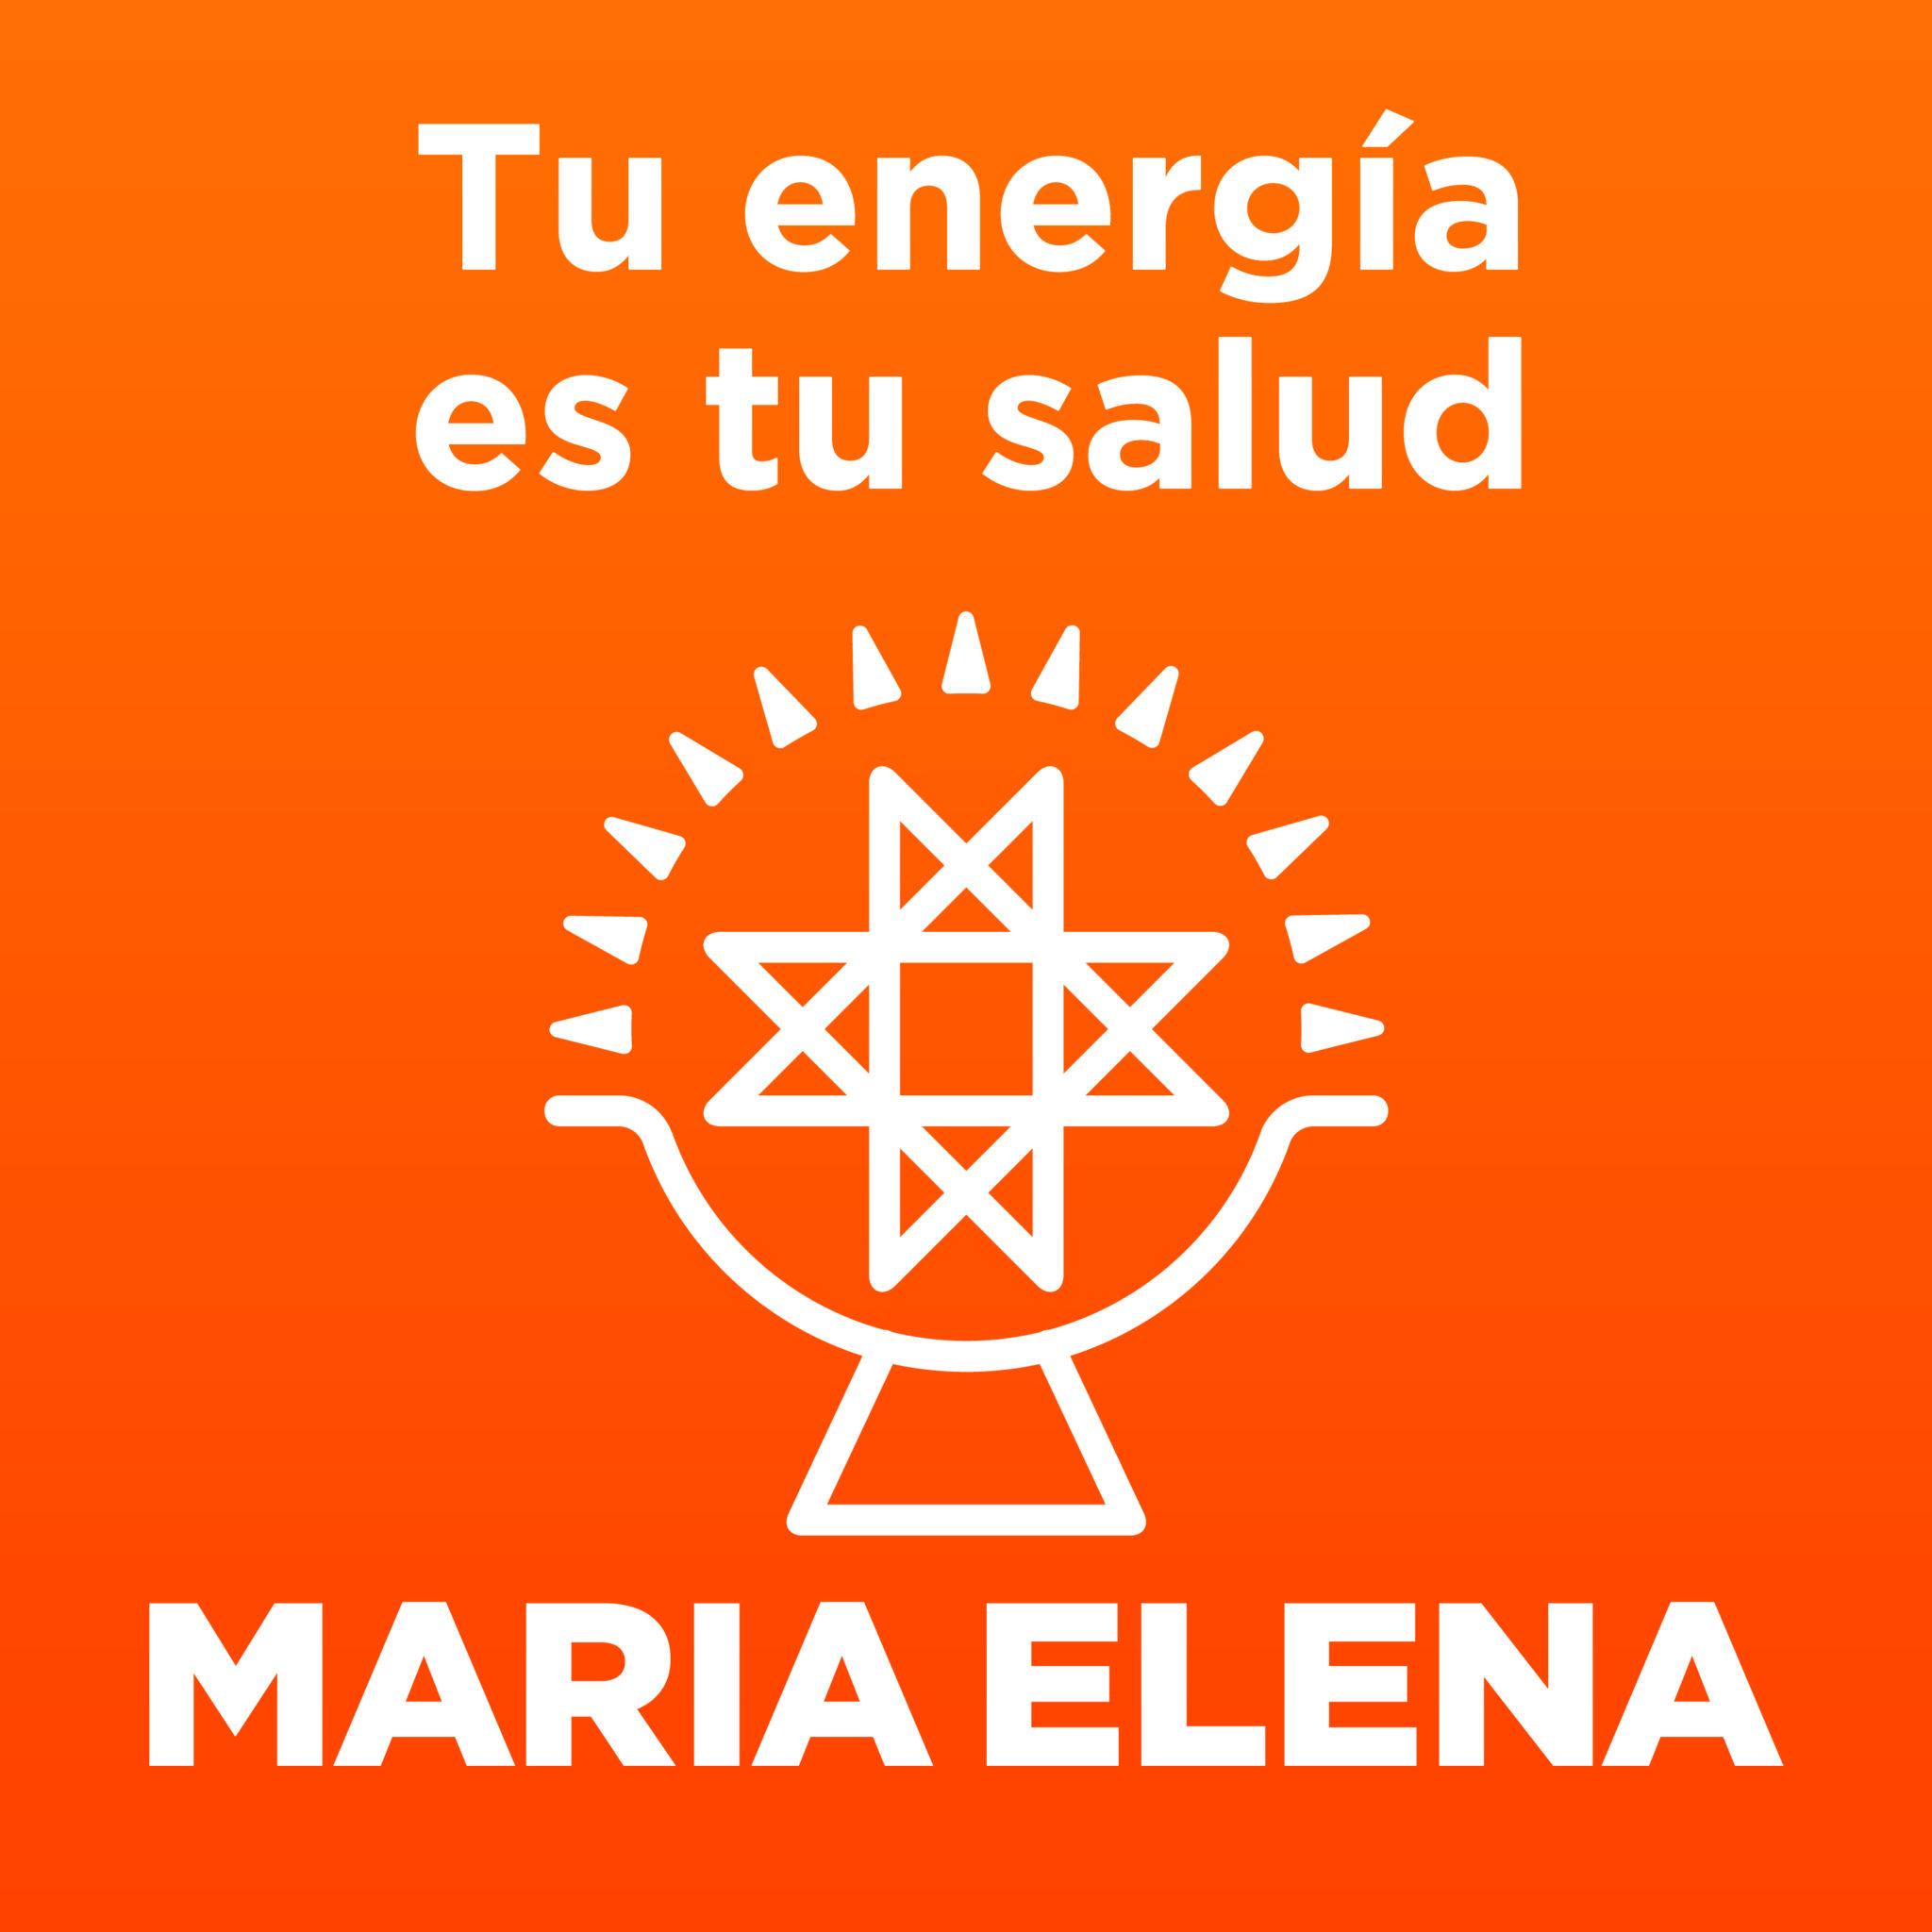 María Elena: Magia Celta